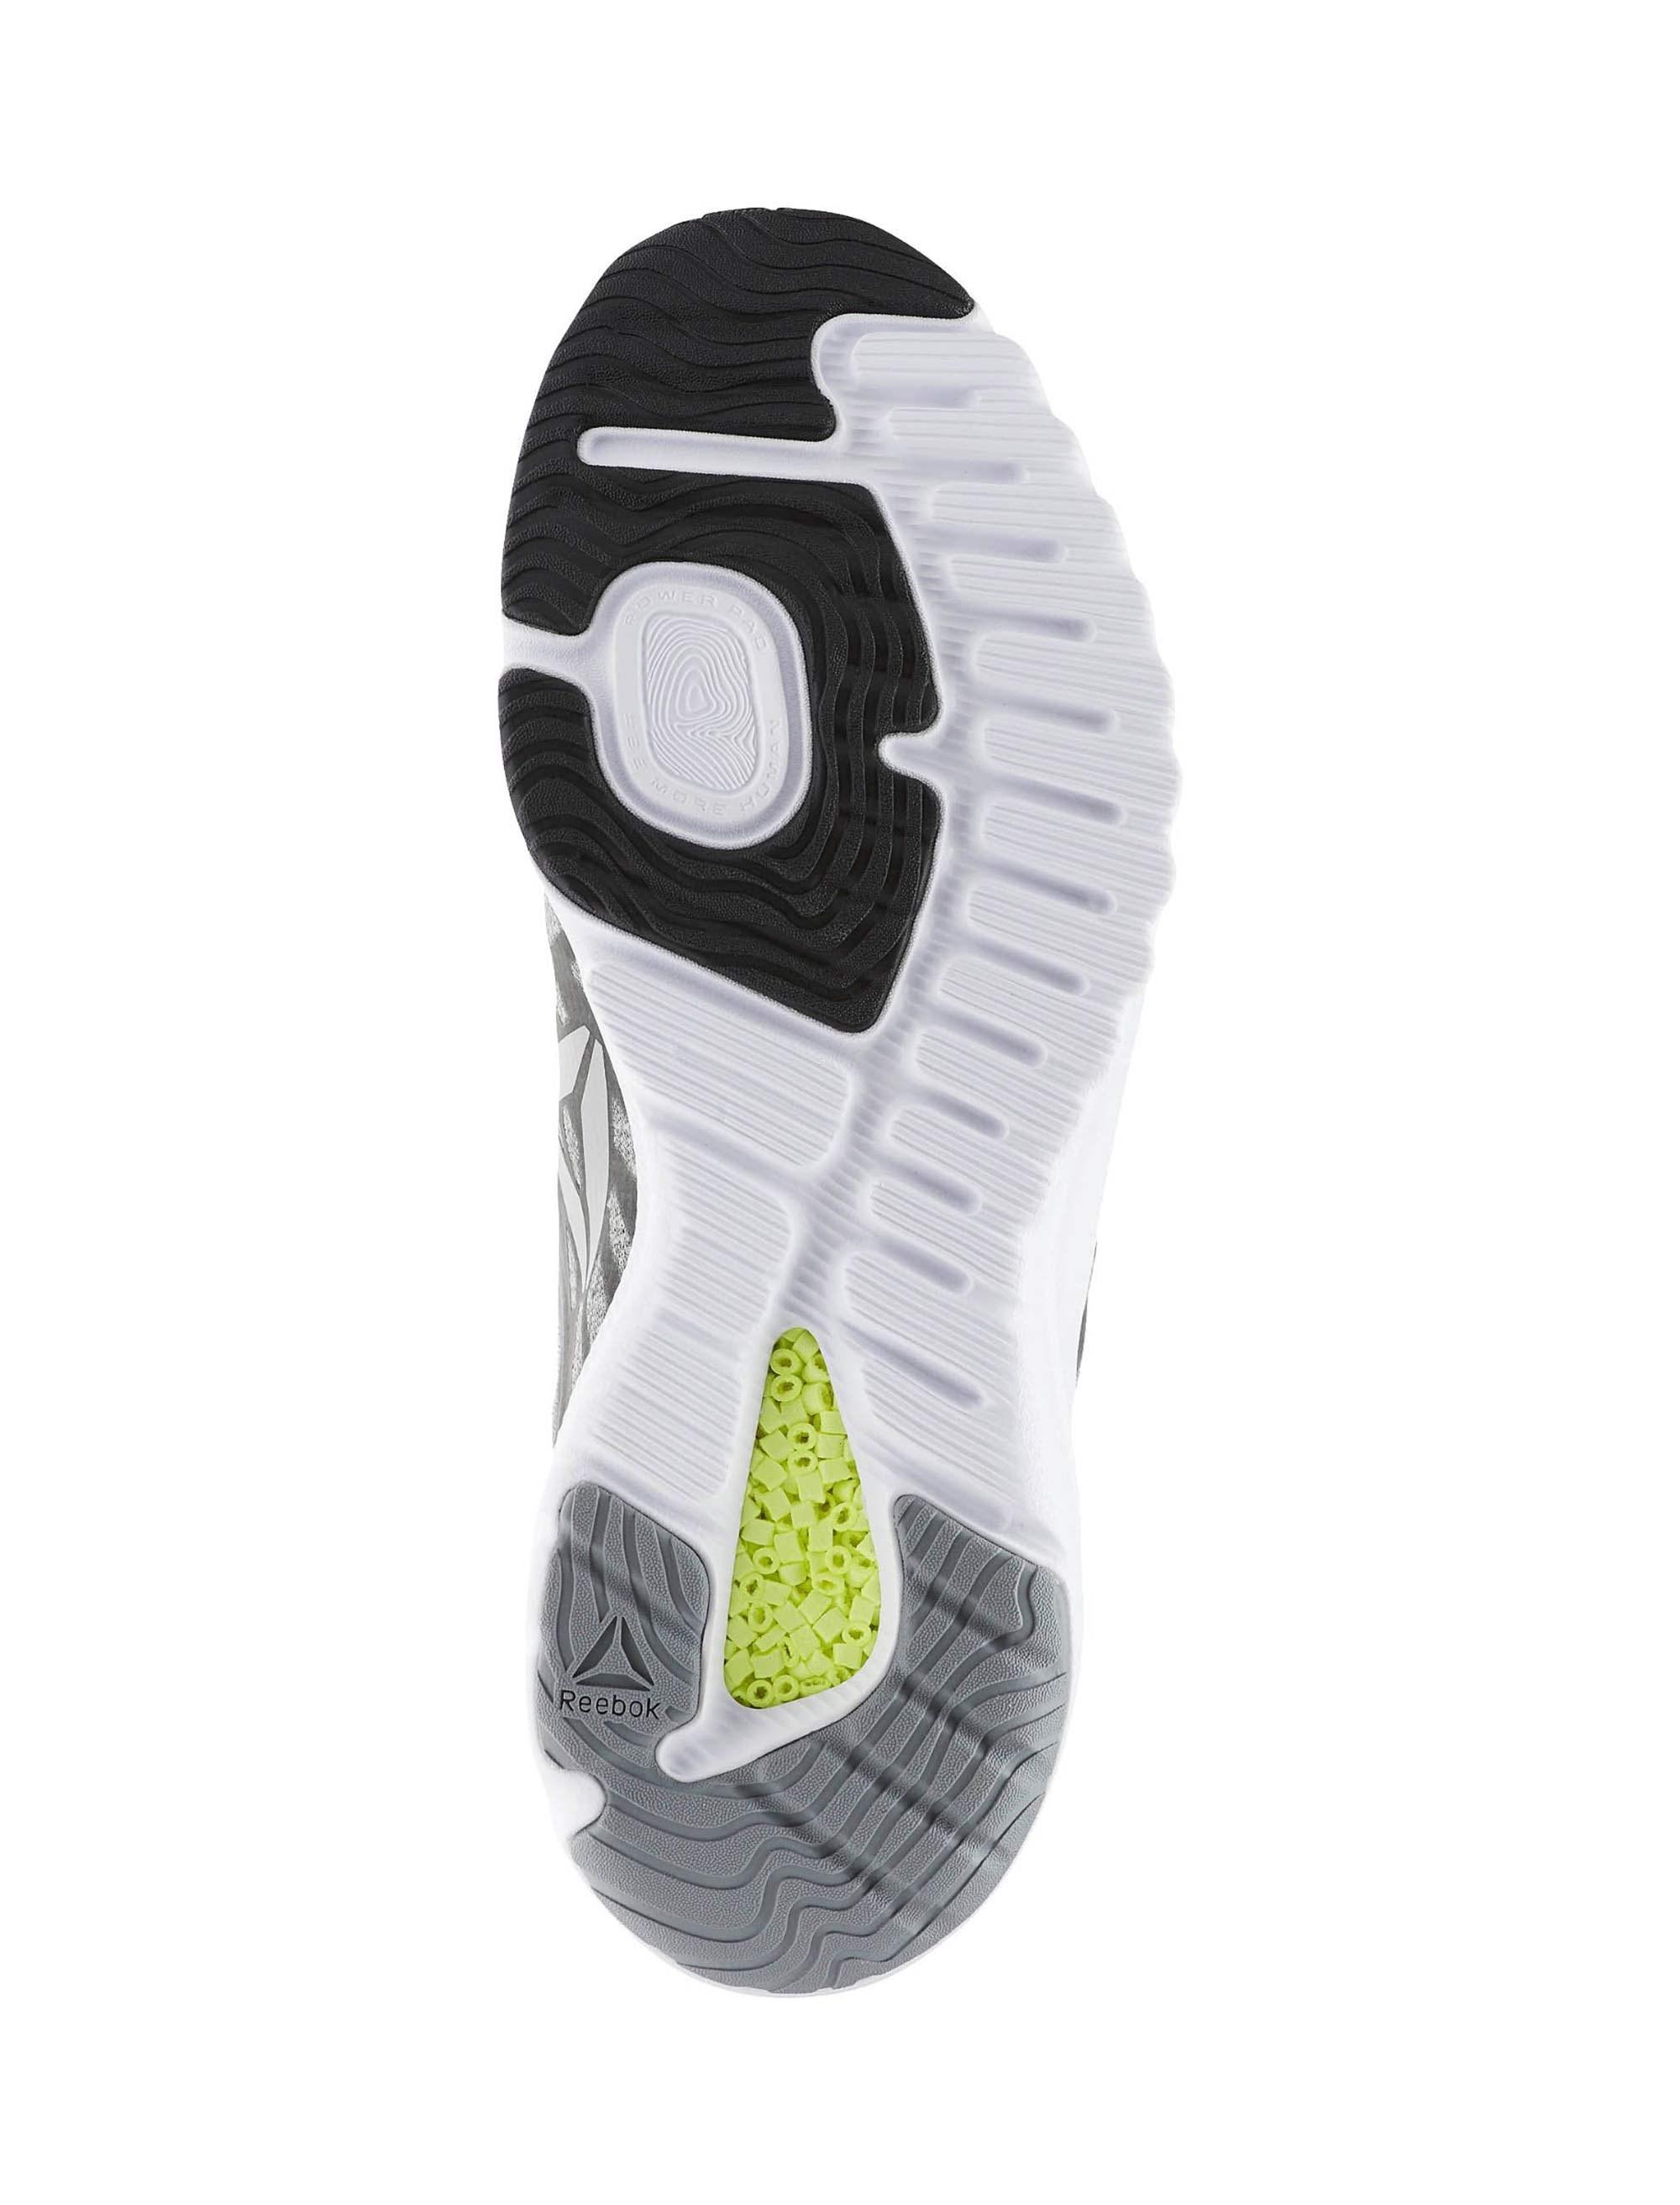 کفش دویدن بندی مردانه OSR Distance 3-0 - طوسي - 2